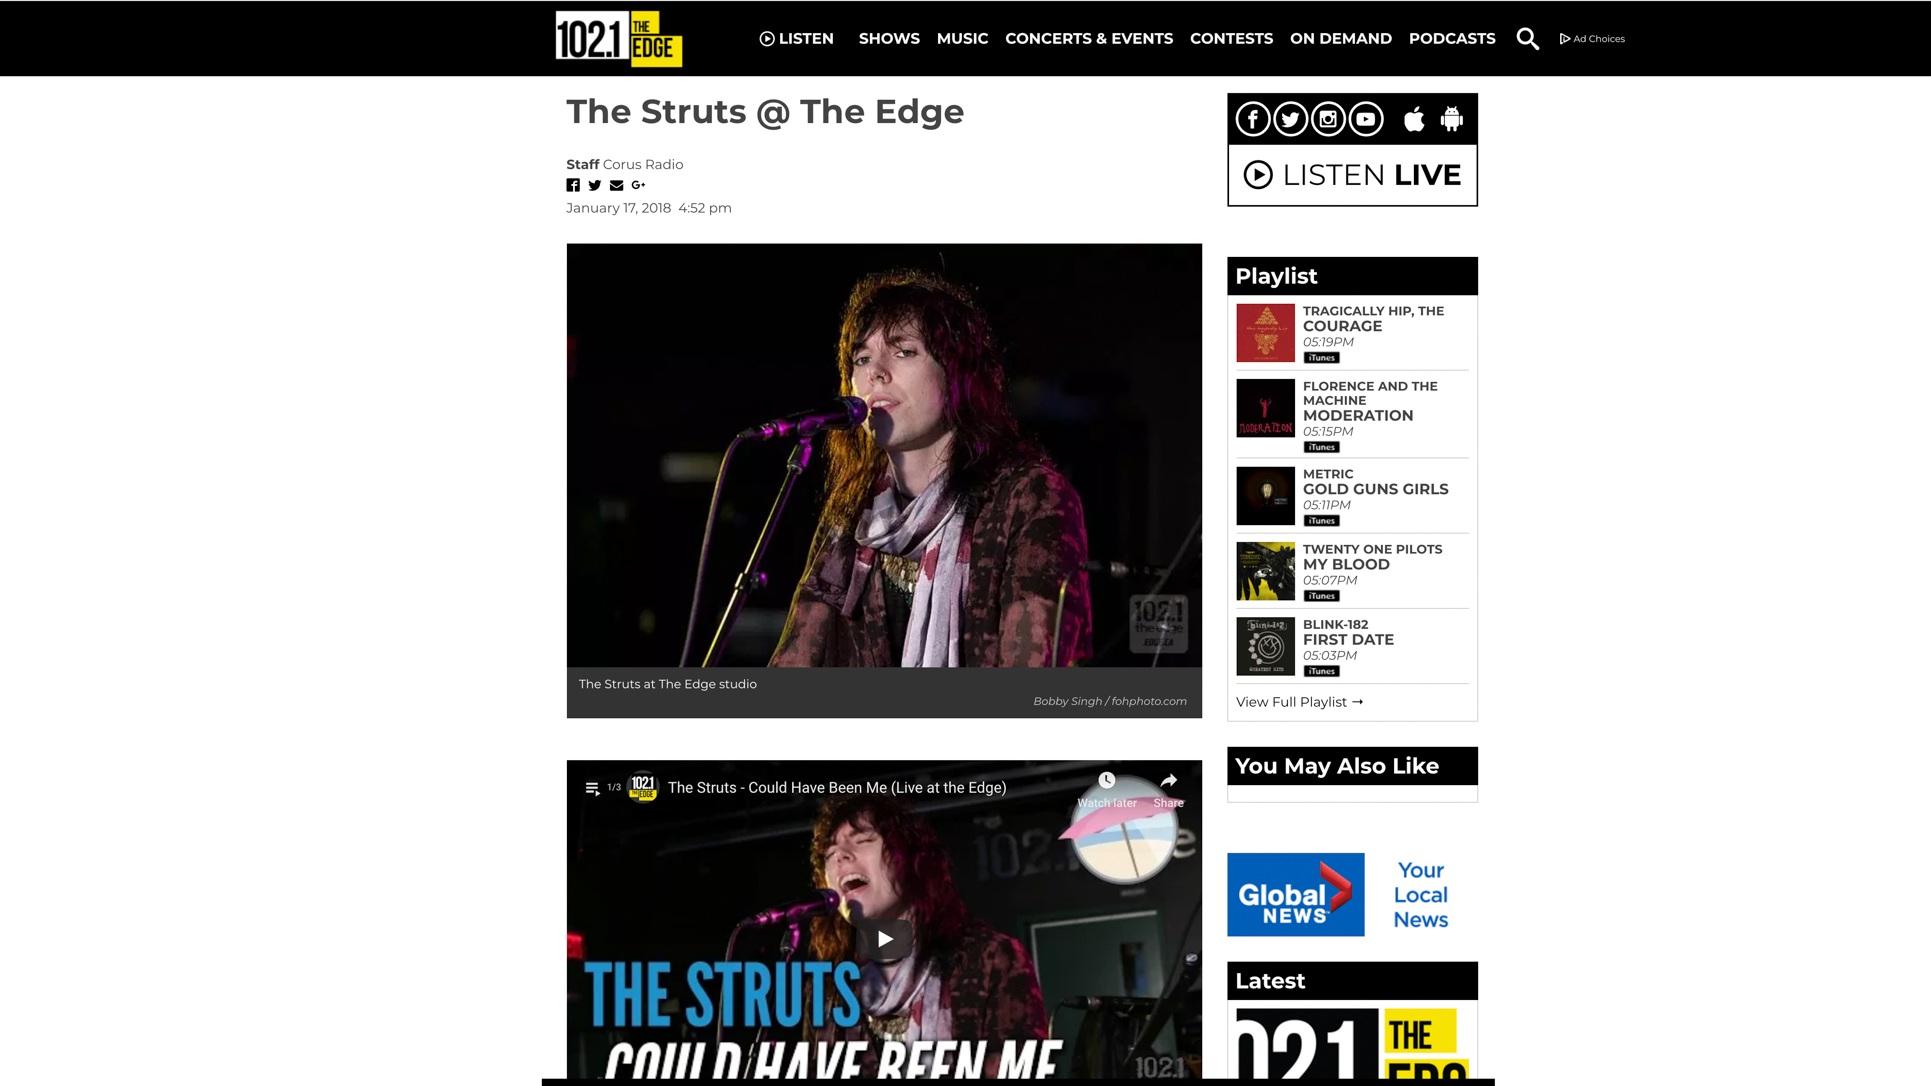 """The Struts"". Edge/Corus Radio. 01.17.2018"